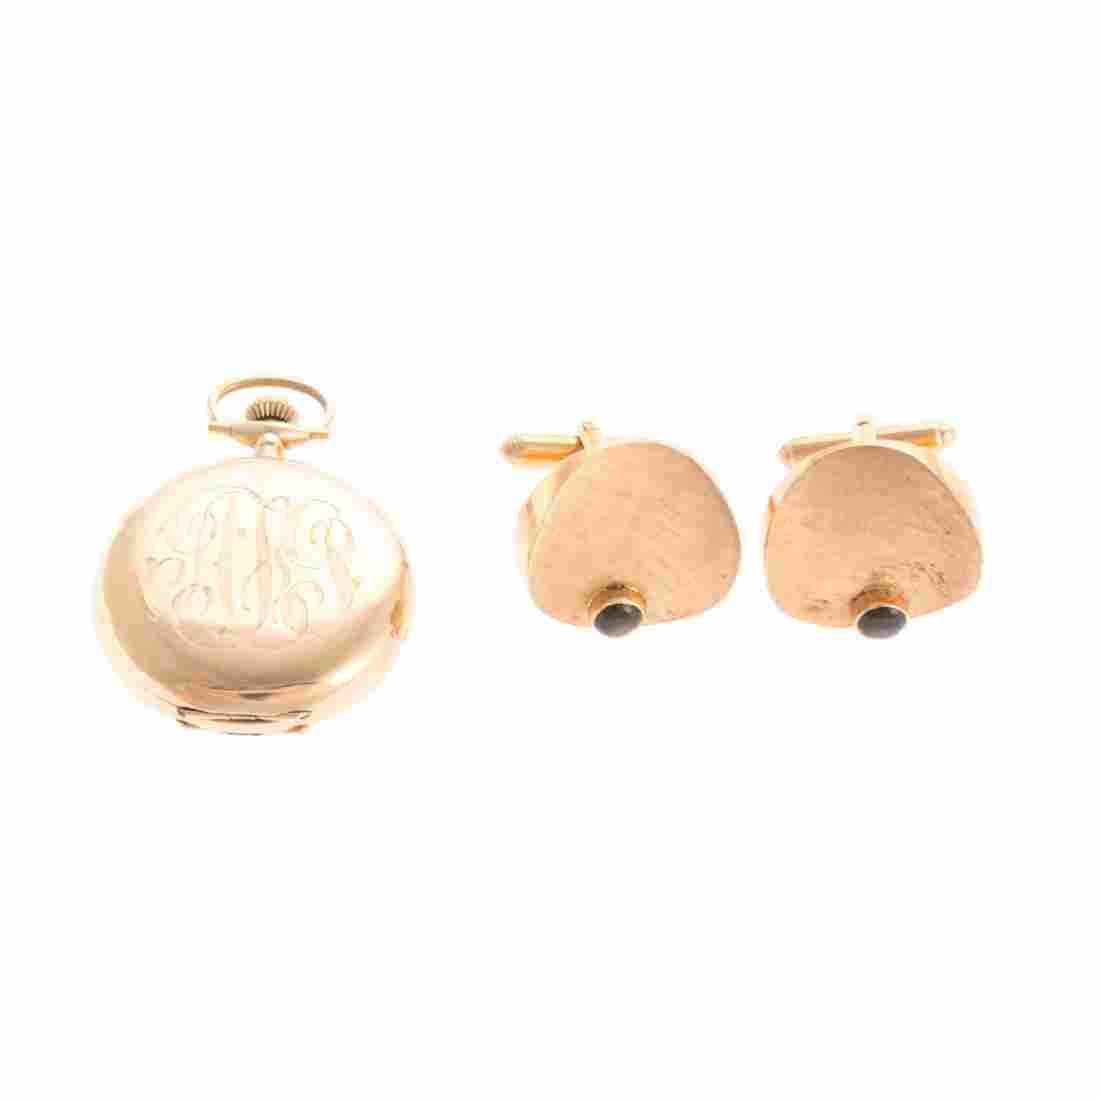 A Gold Waltham Pocket Watch & Gold Cufflinks